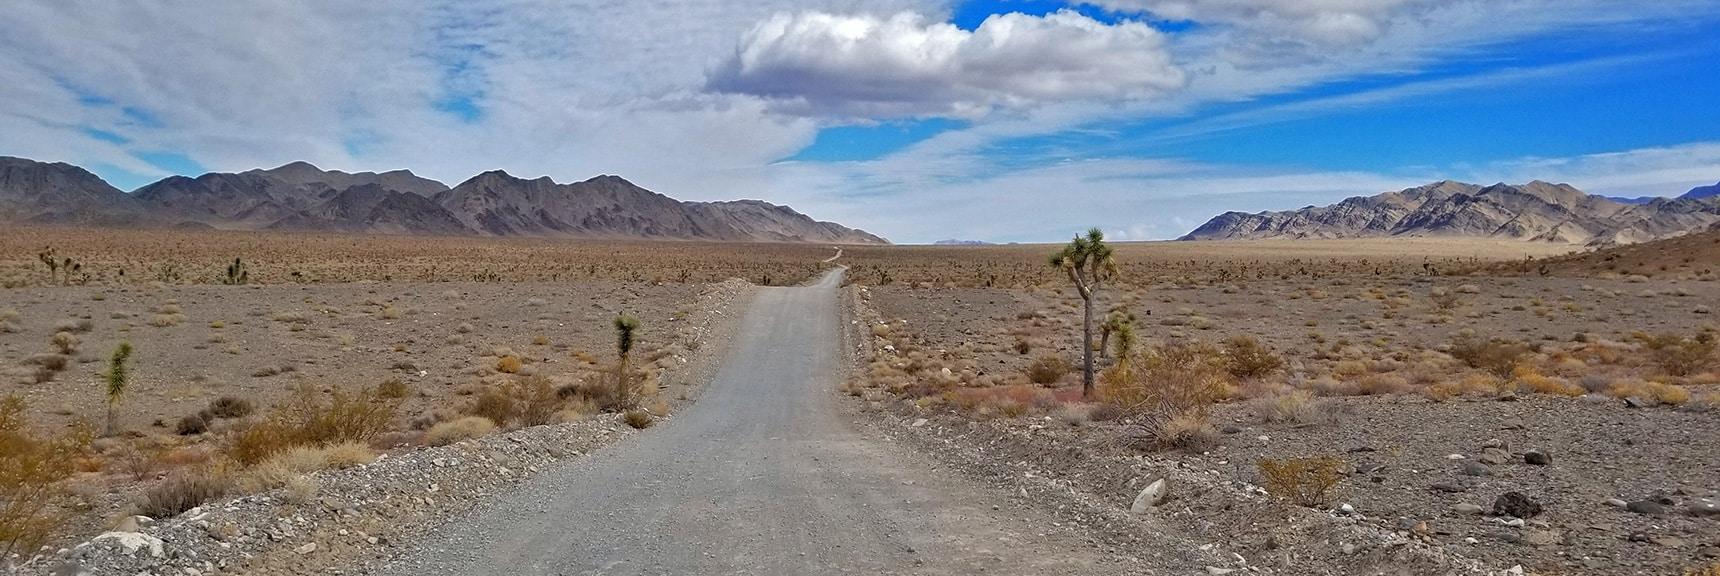 View Up Alamo Road Towards Sheep Pass Area   Lower Alamo Road   Sheep Range   Desert National Wildlife Refuge, Nevada